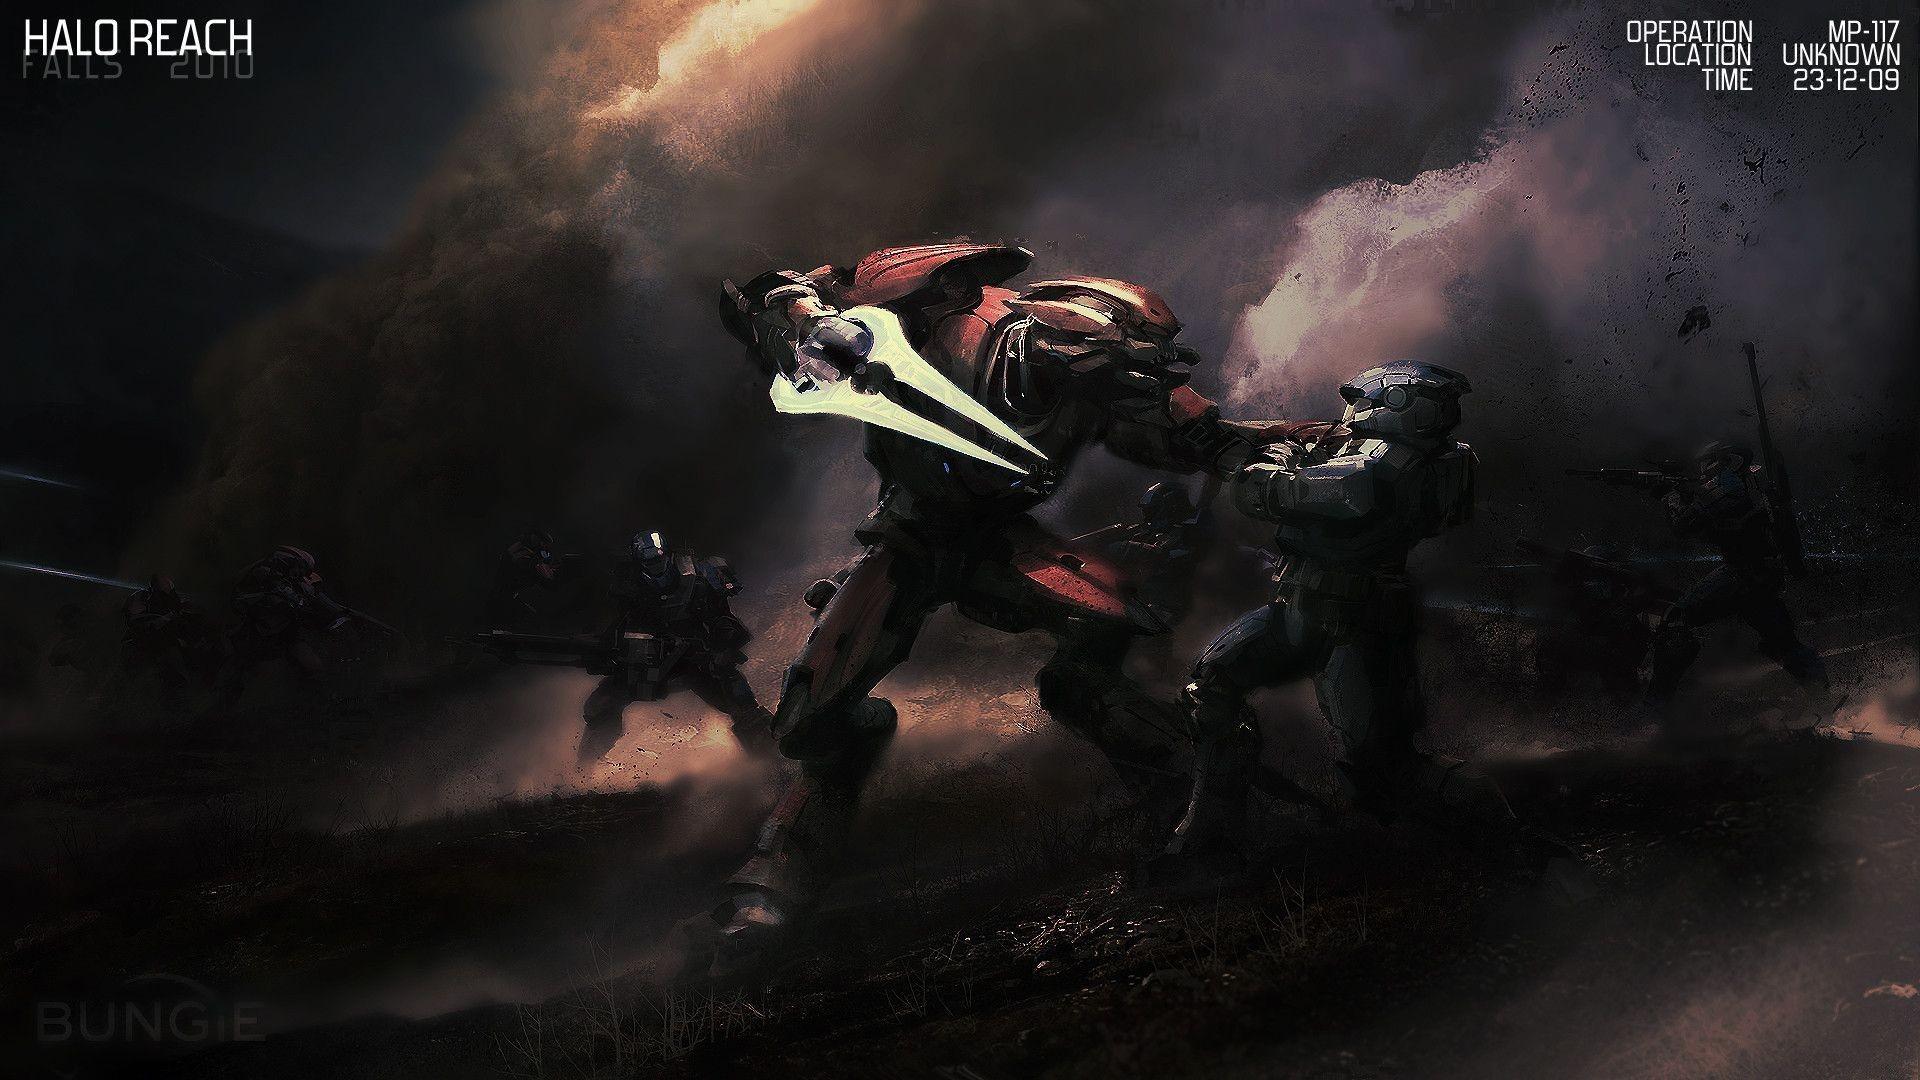 Hd halo wallpaper 76 images - Halo 5 screensaver ...